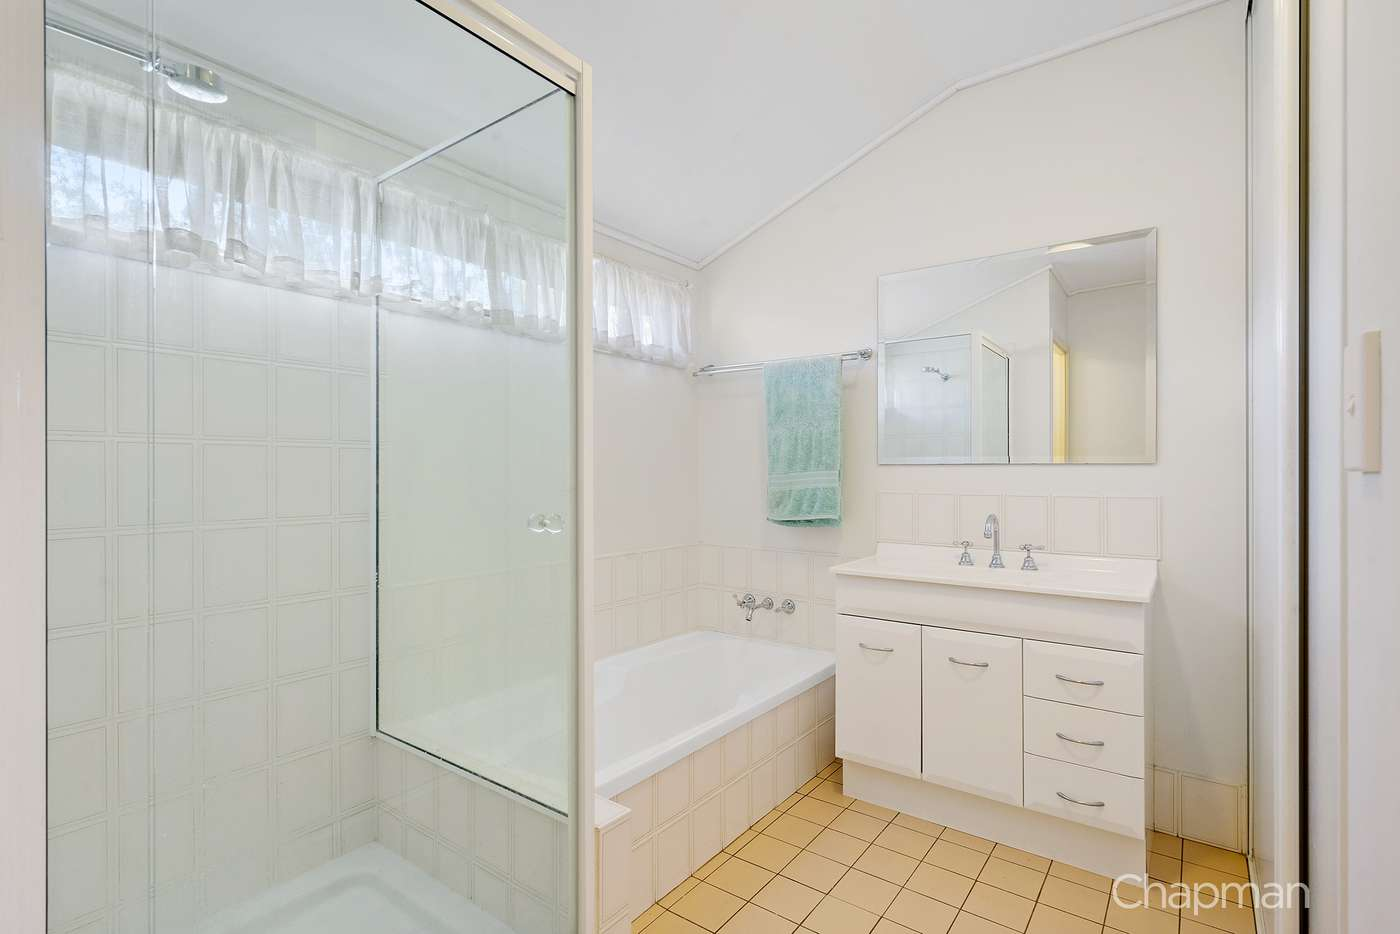 Sixth view of Homely house listing, 11 Koala Road, Blaxland NSW 2774